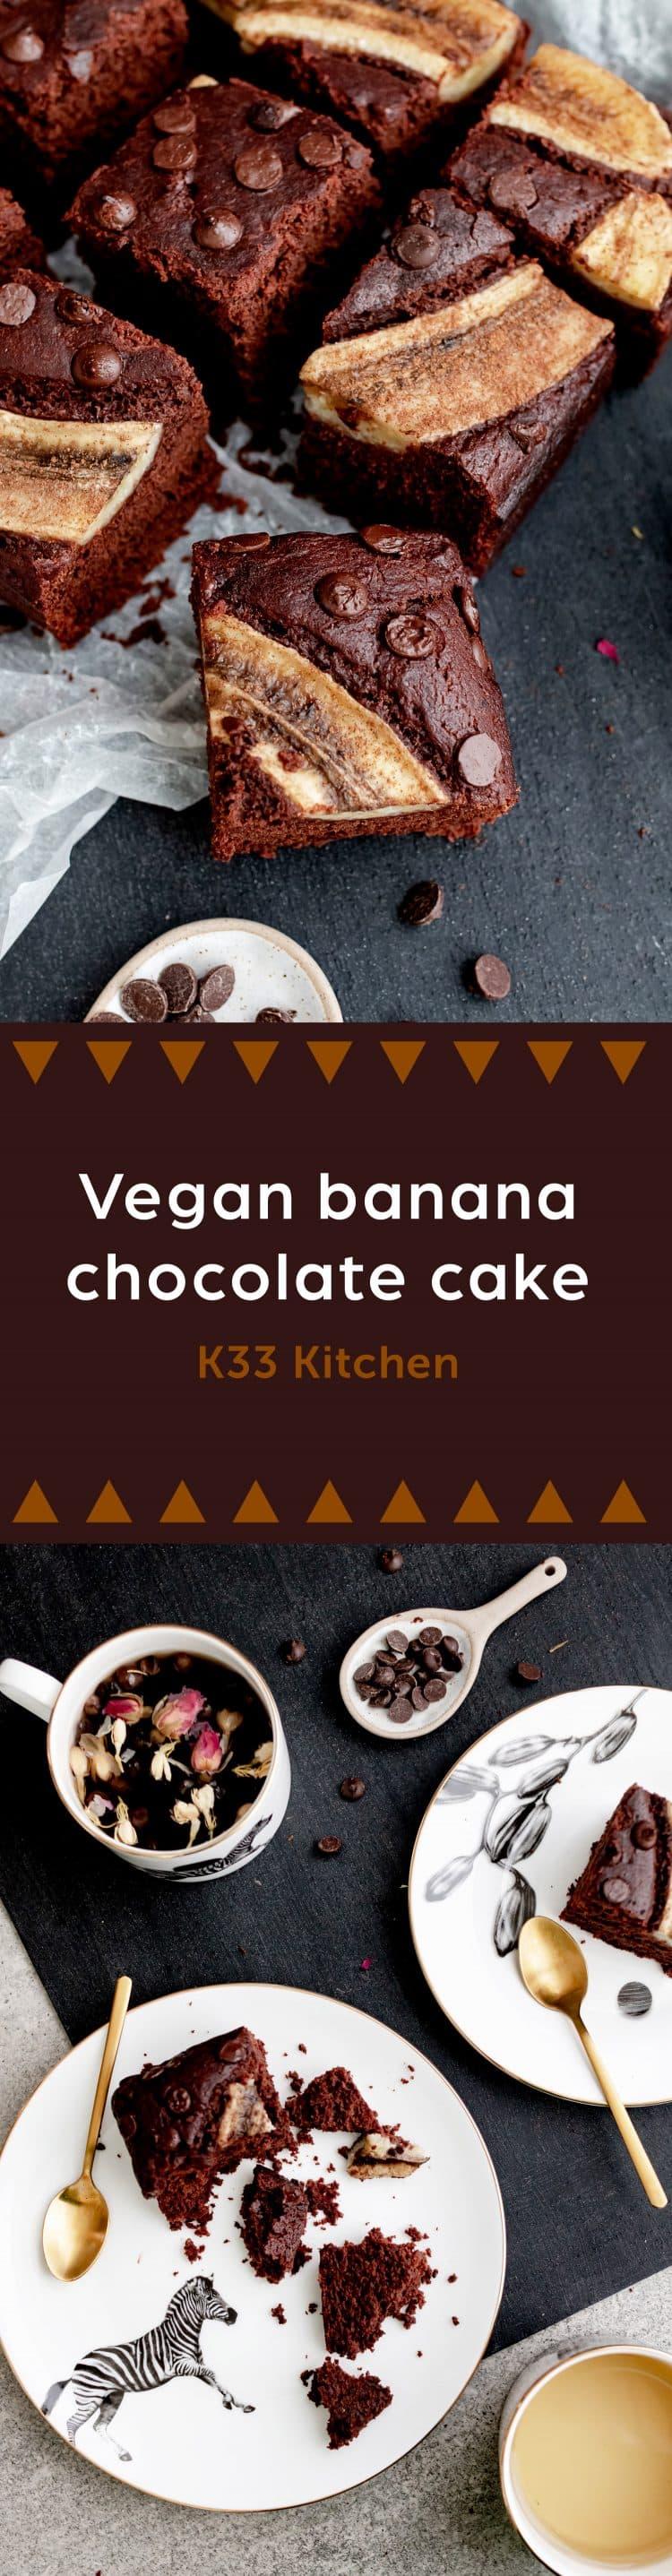 K33kitchen vegan banana chocolate cake